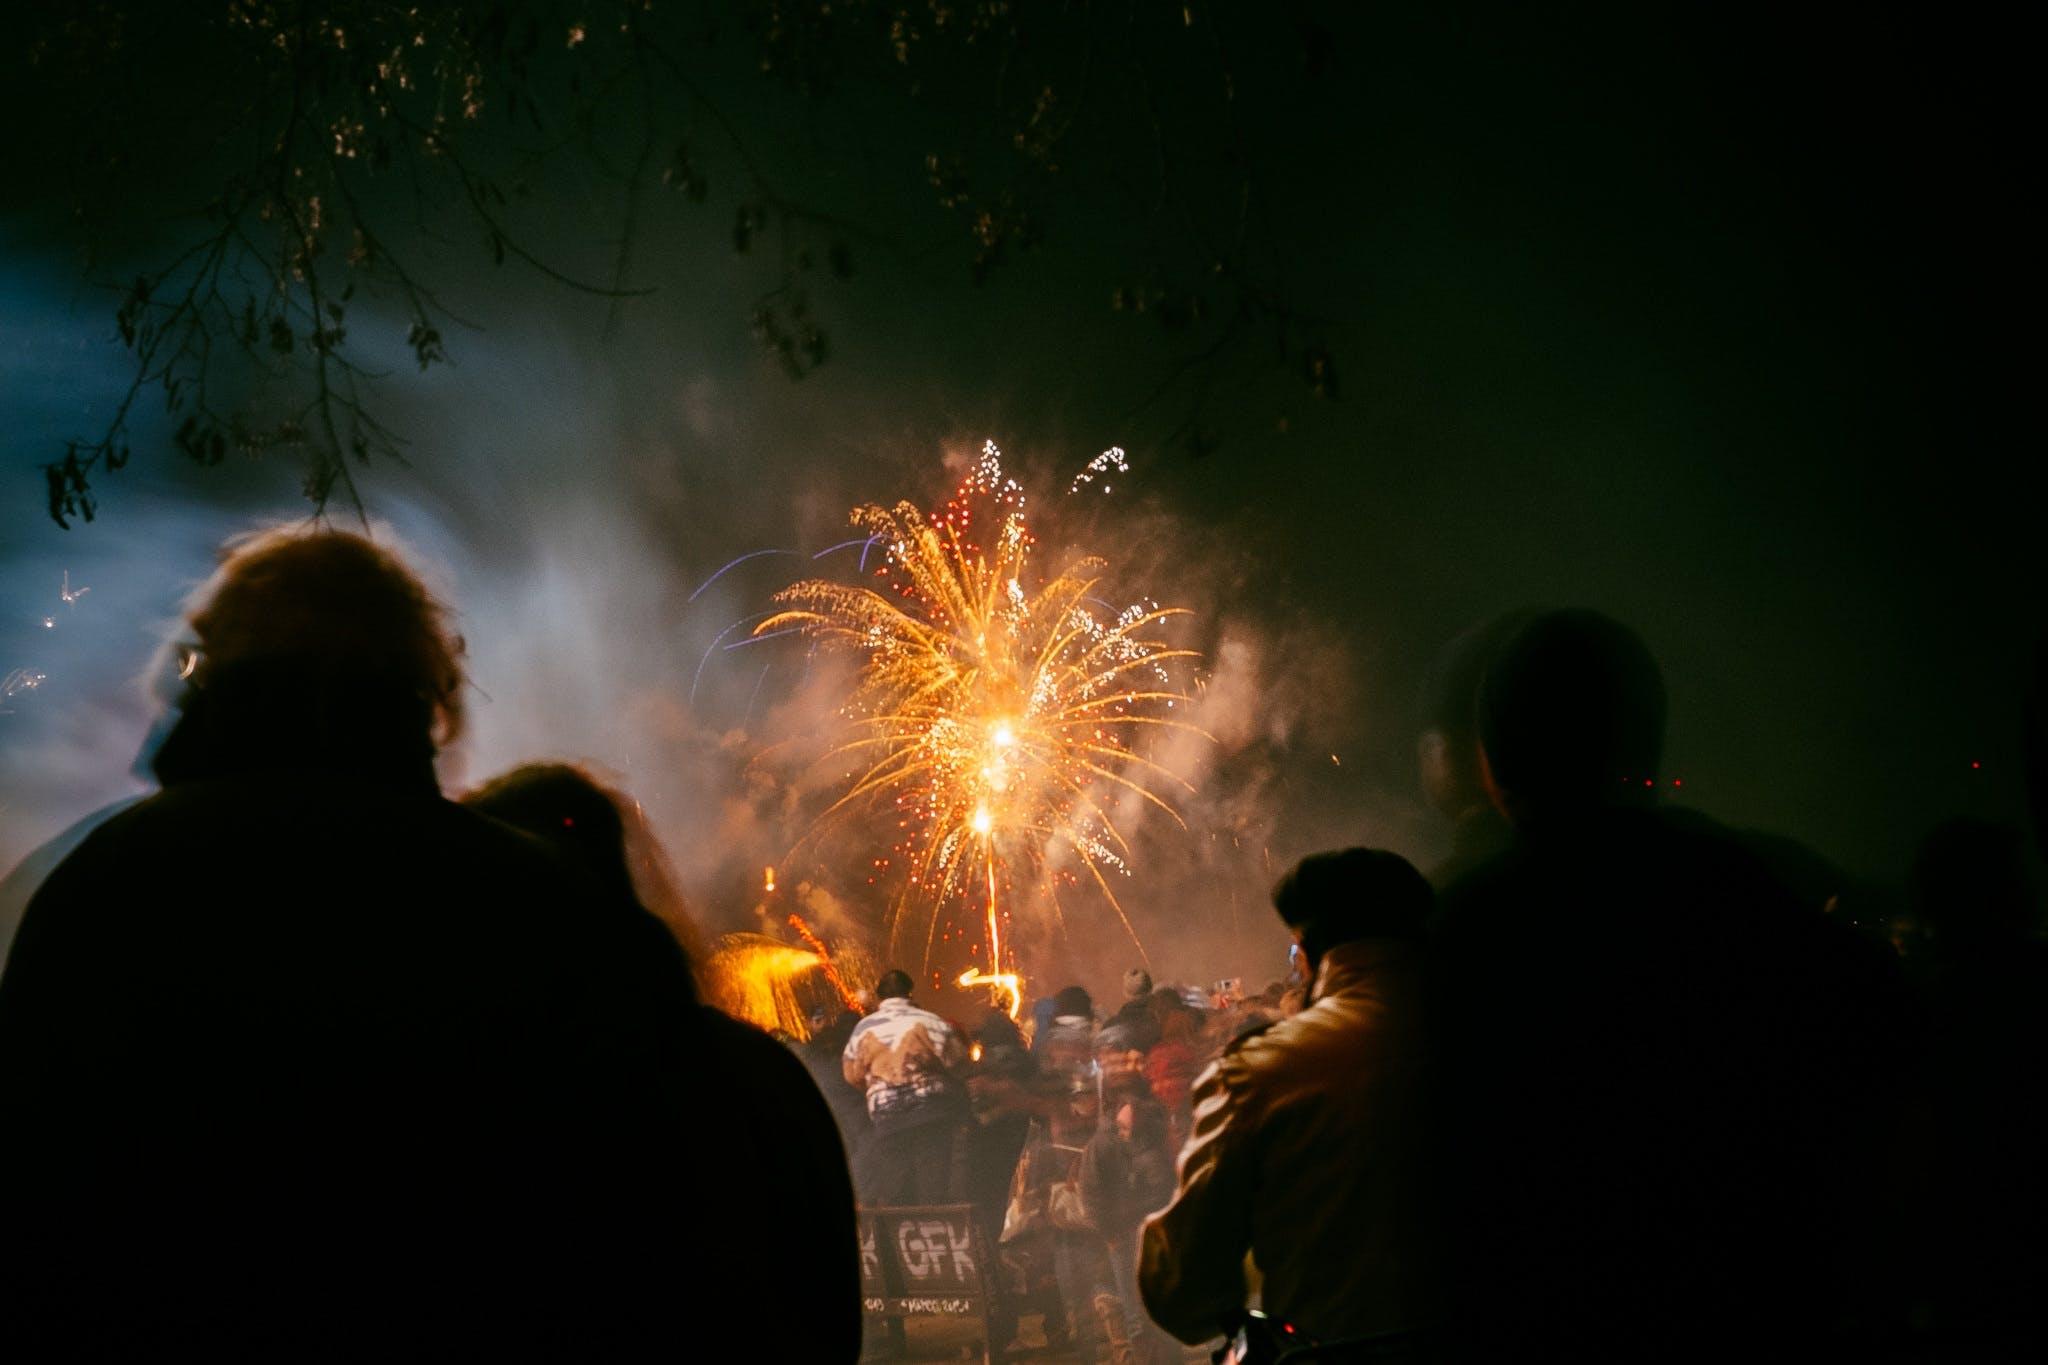 Kostenloses Stock Foto zu festival, party, explosion, menge